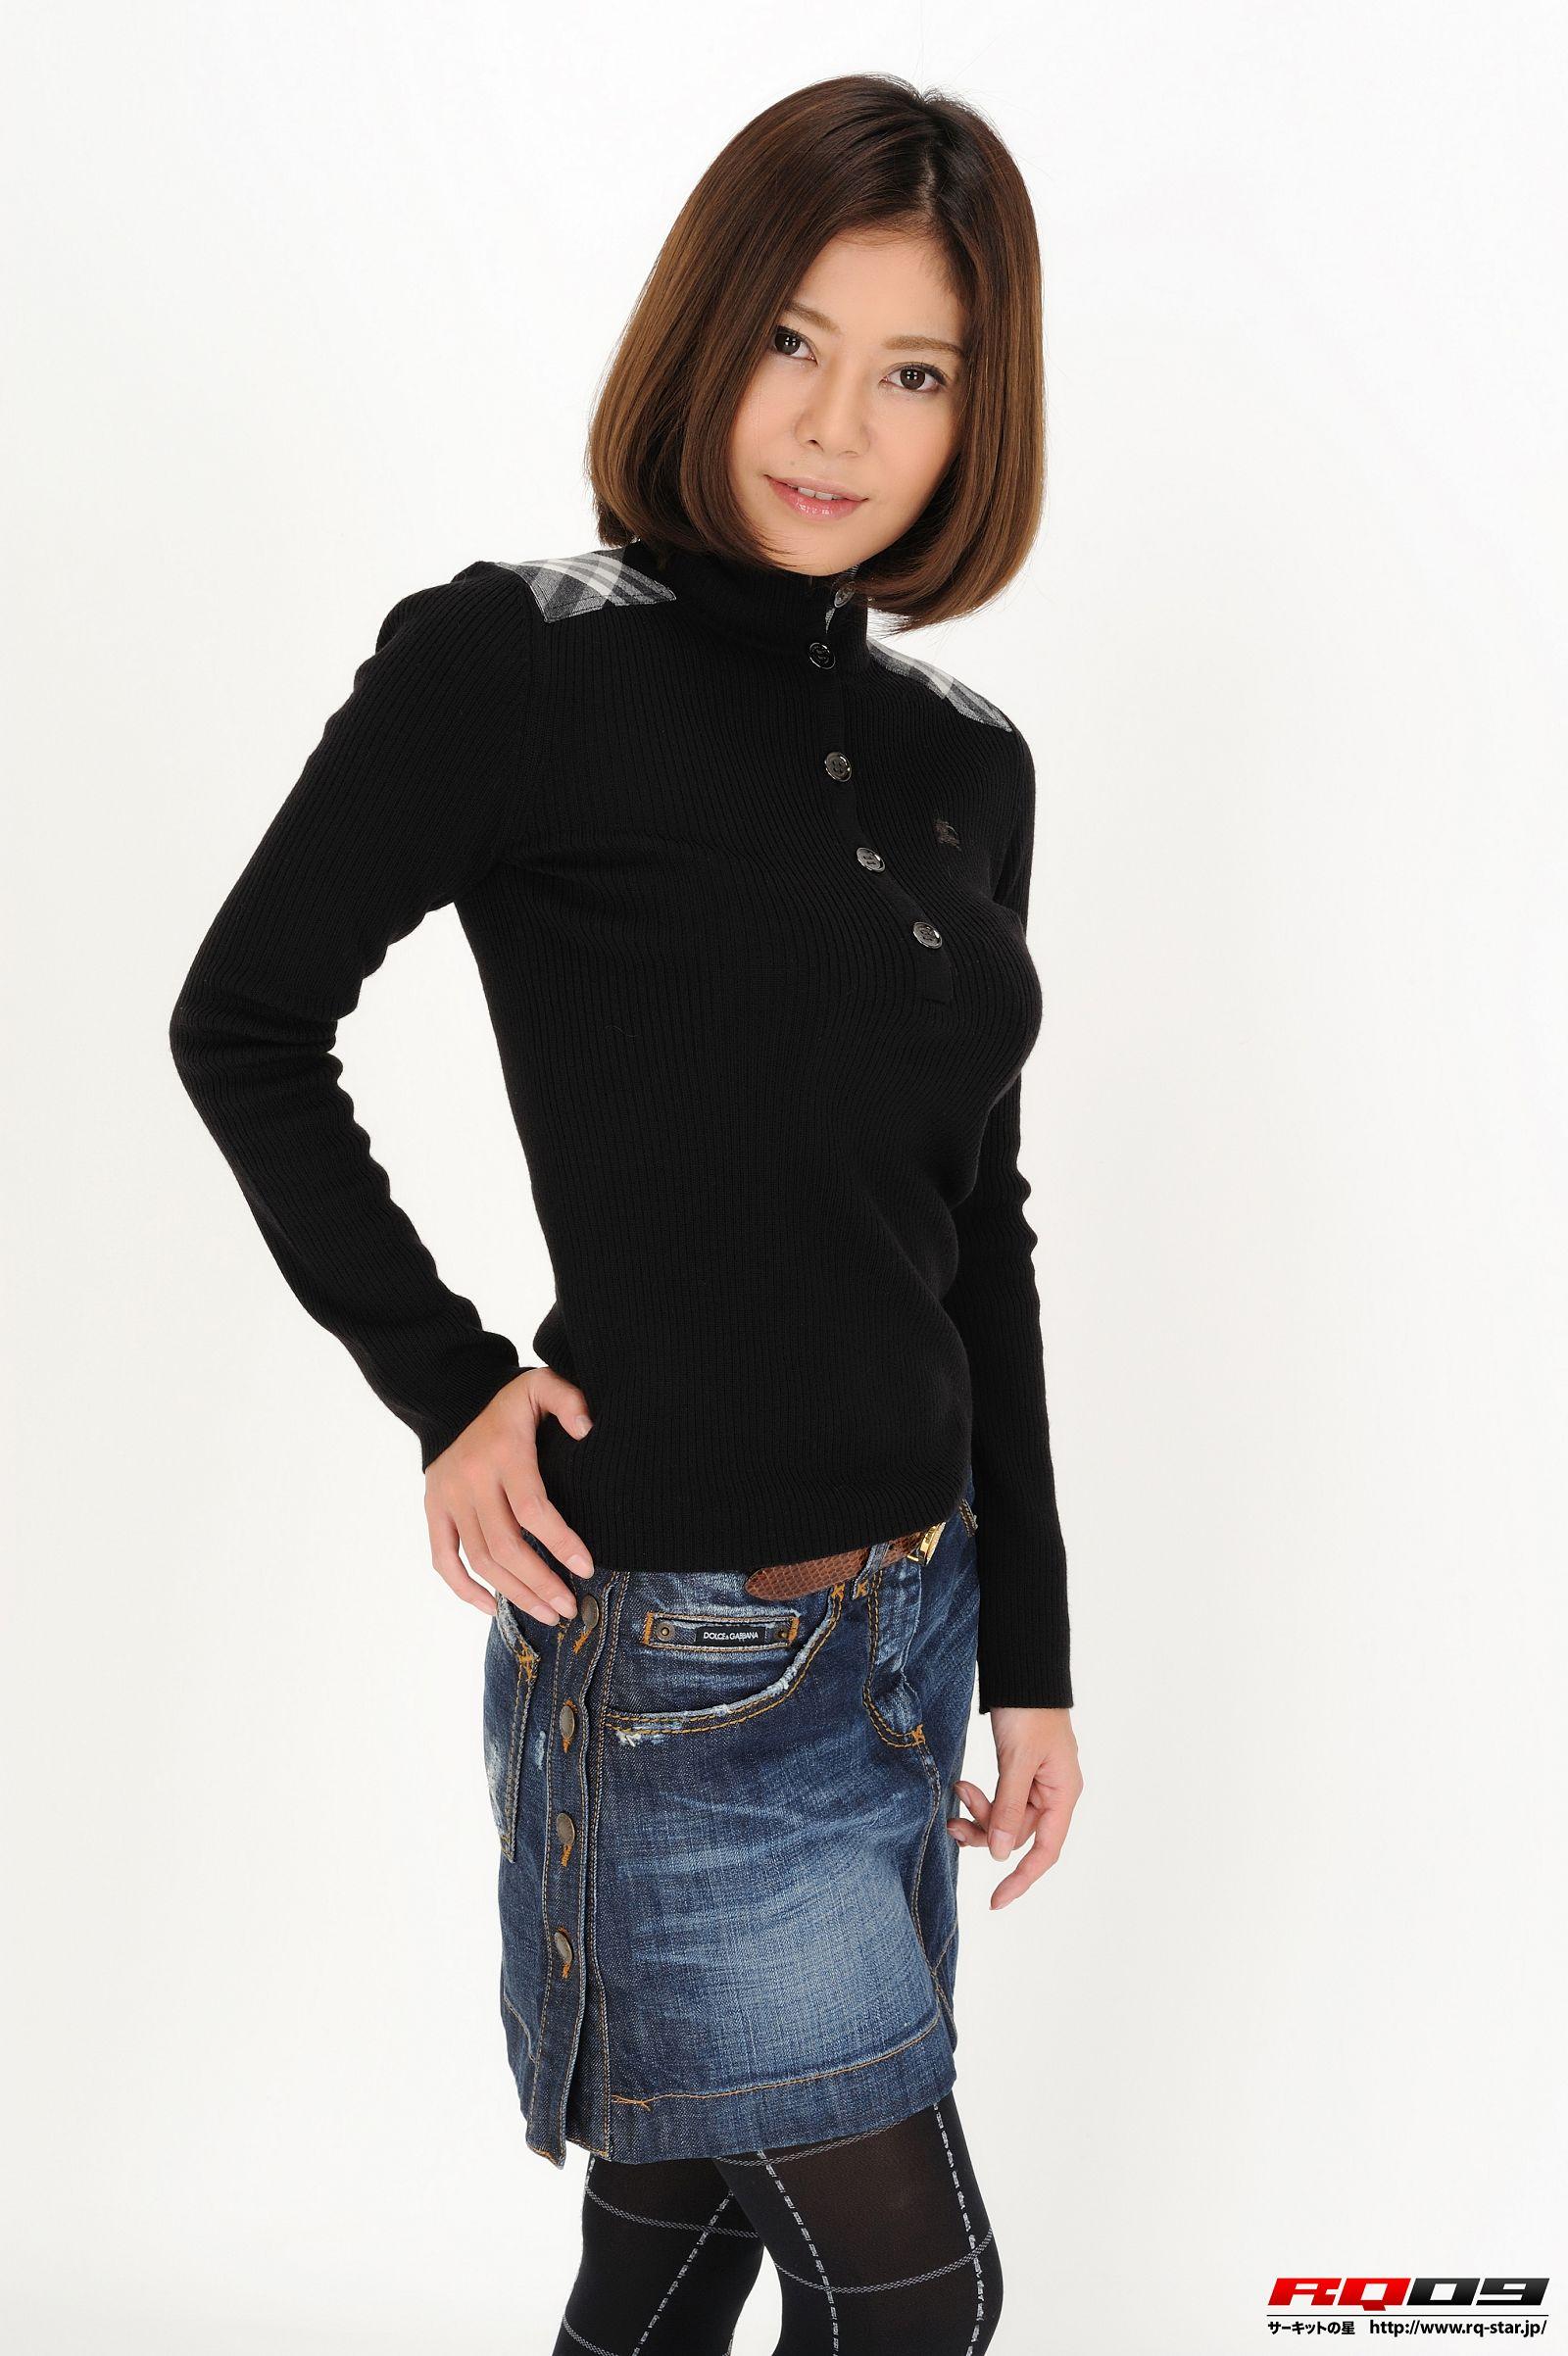 [RQ-STAR美女] NO.0218 Erika Mostardini モスタルディーニエリカ Private Dress3